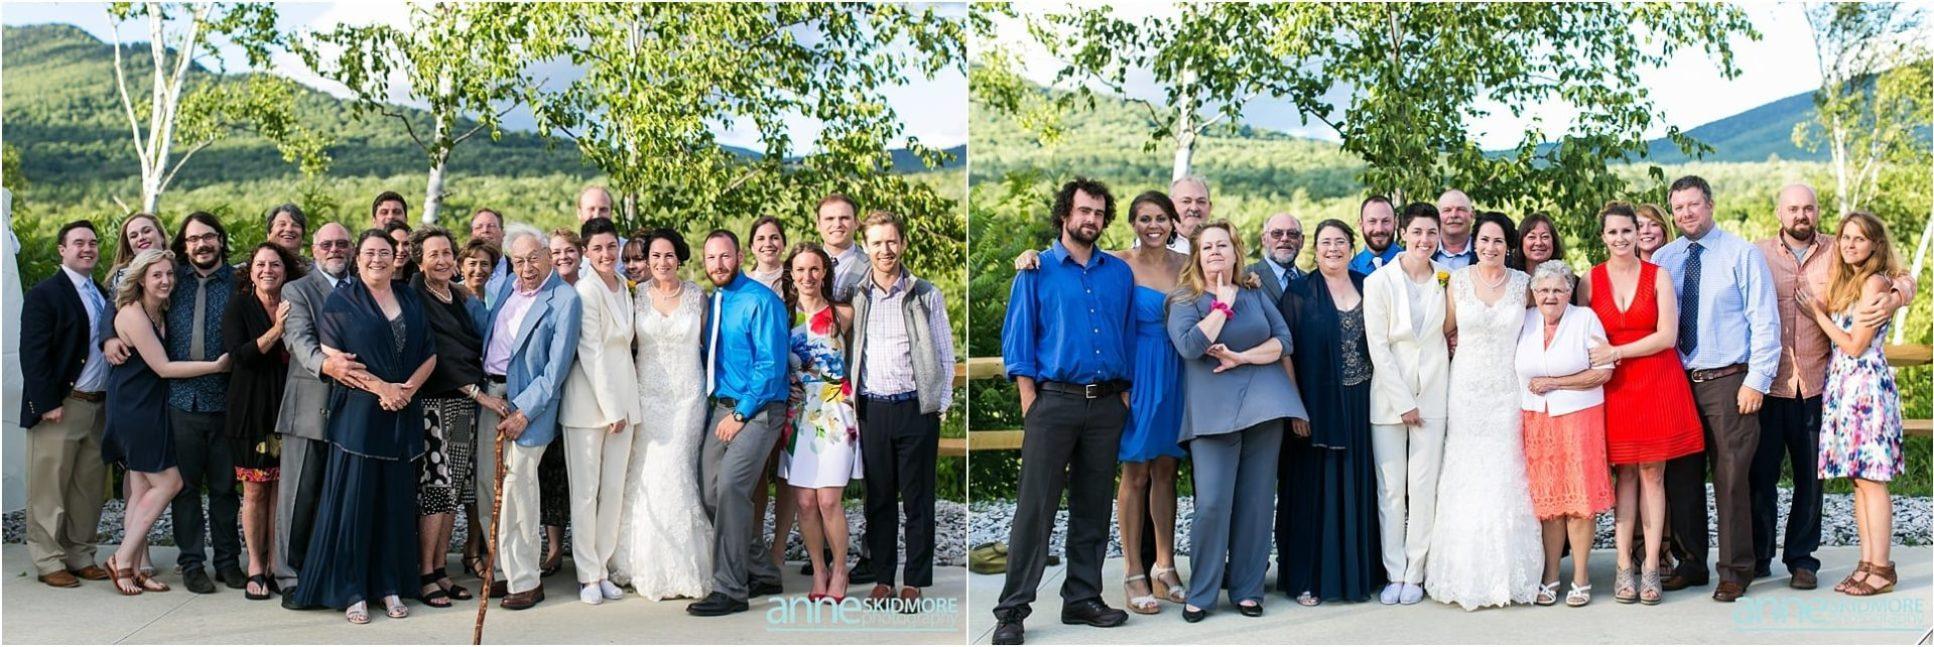 Eagle_Mountain_House_Wedding__090